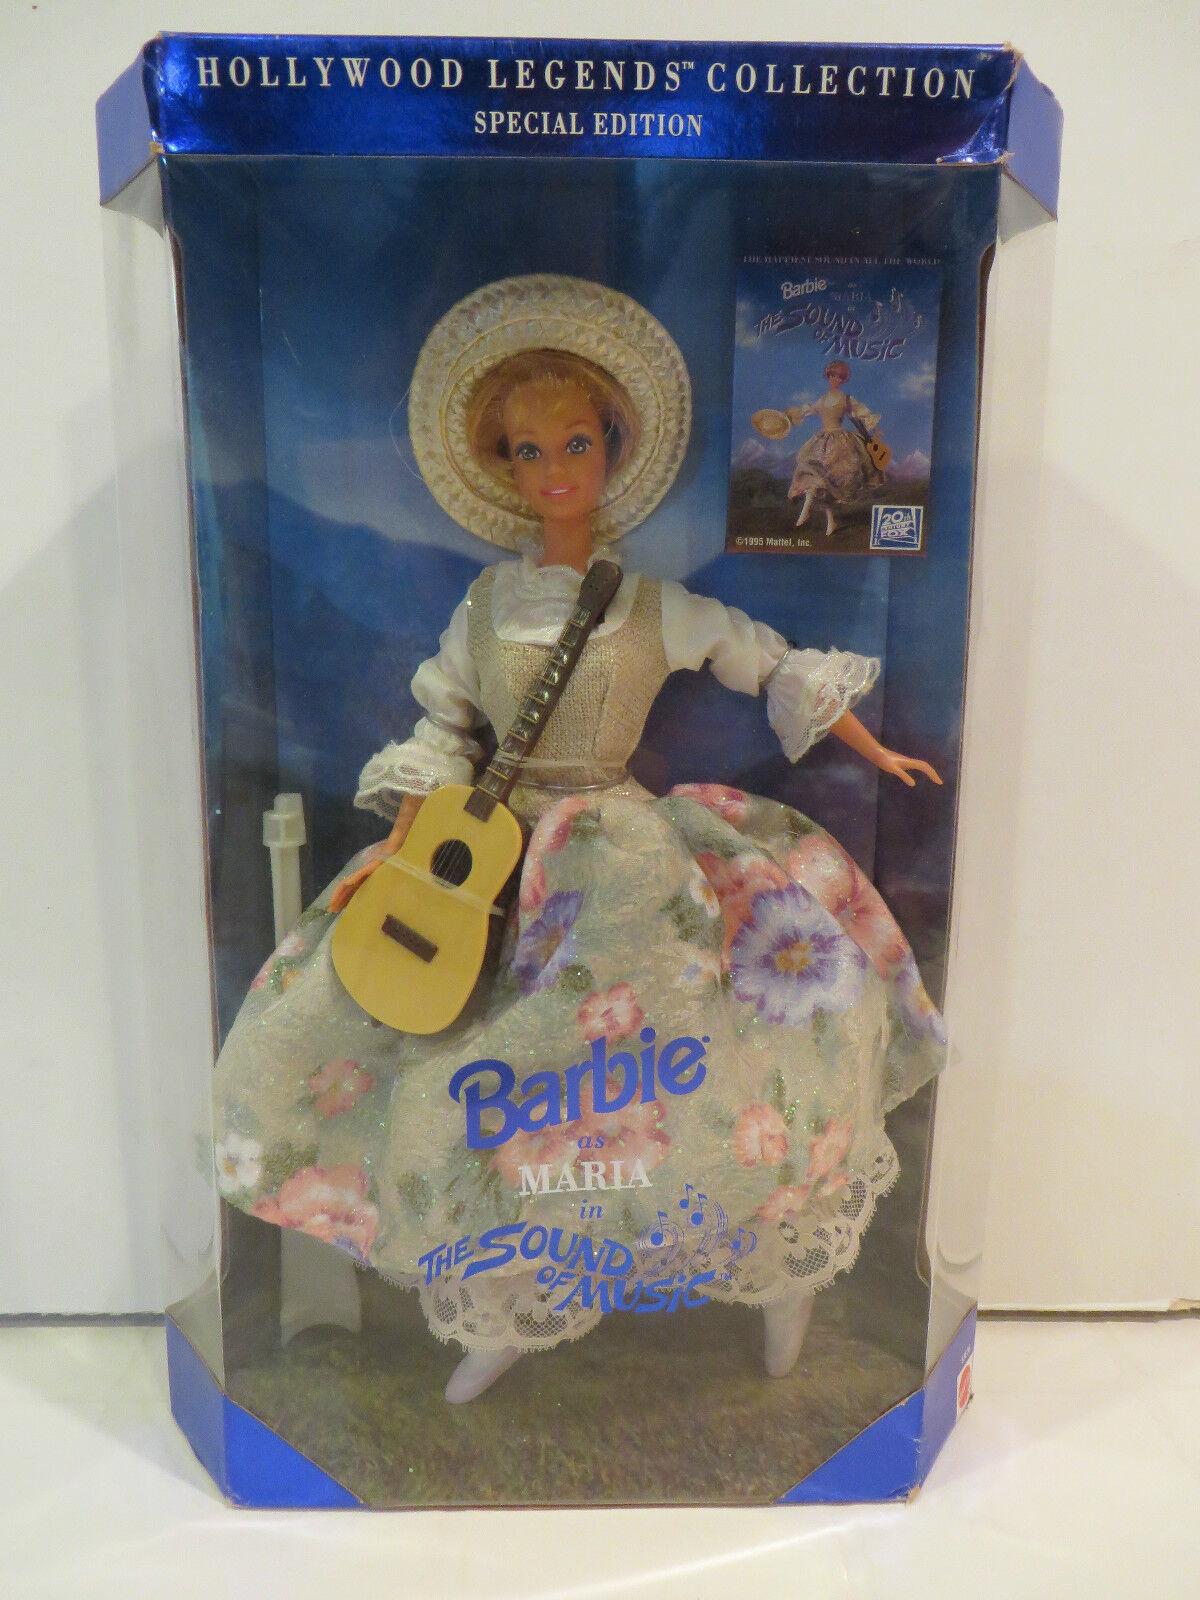 Hollywood Legends Collection Special Edition Barbie como Maria